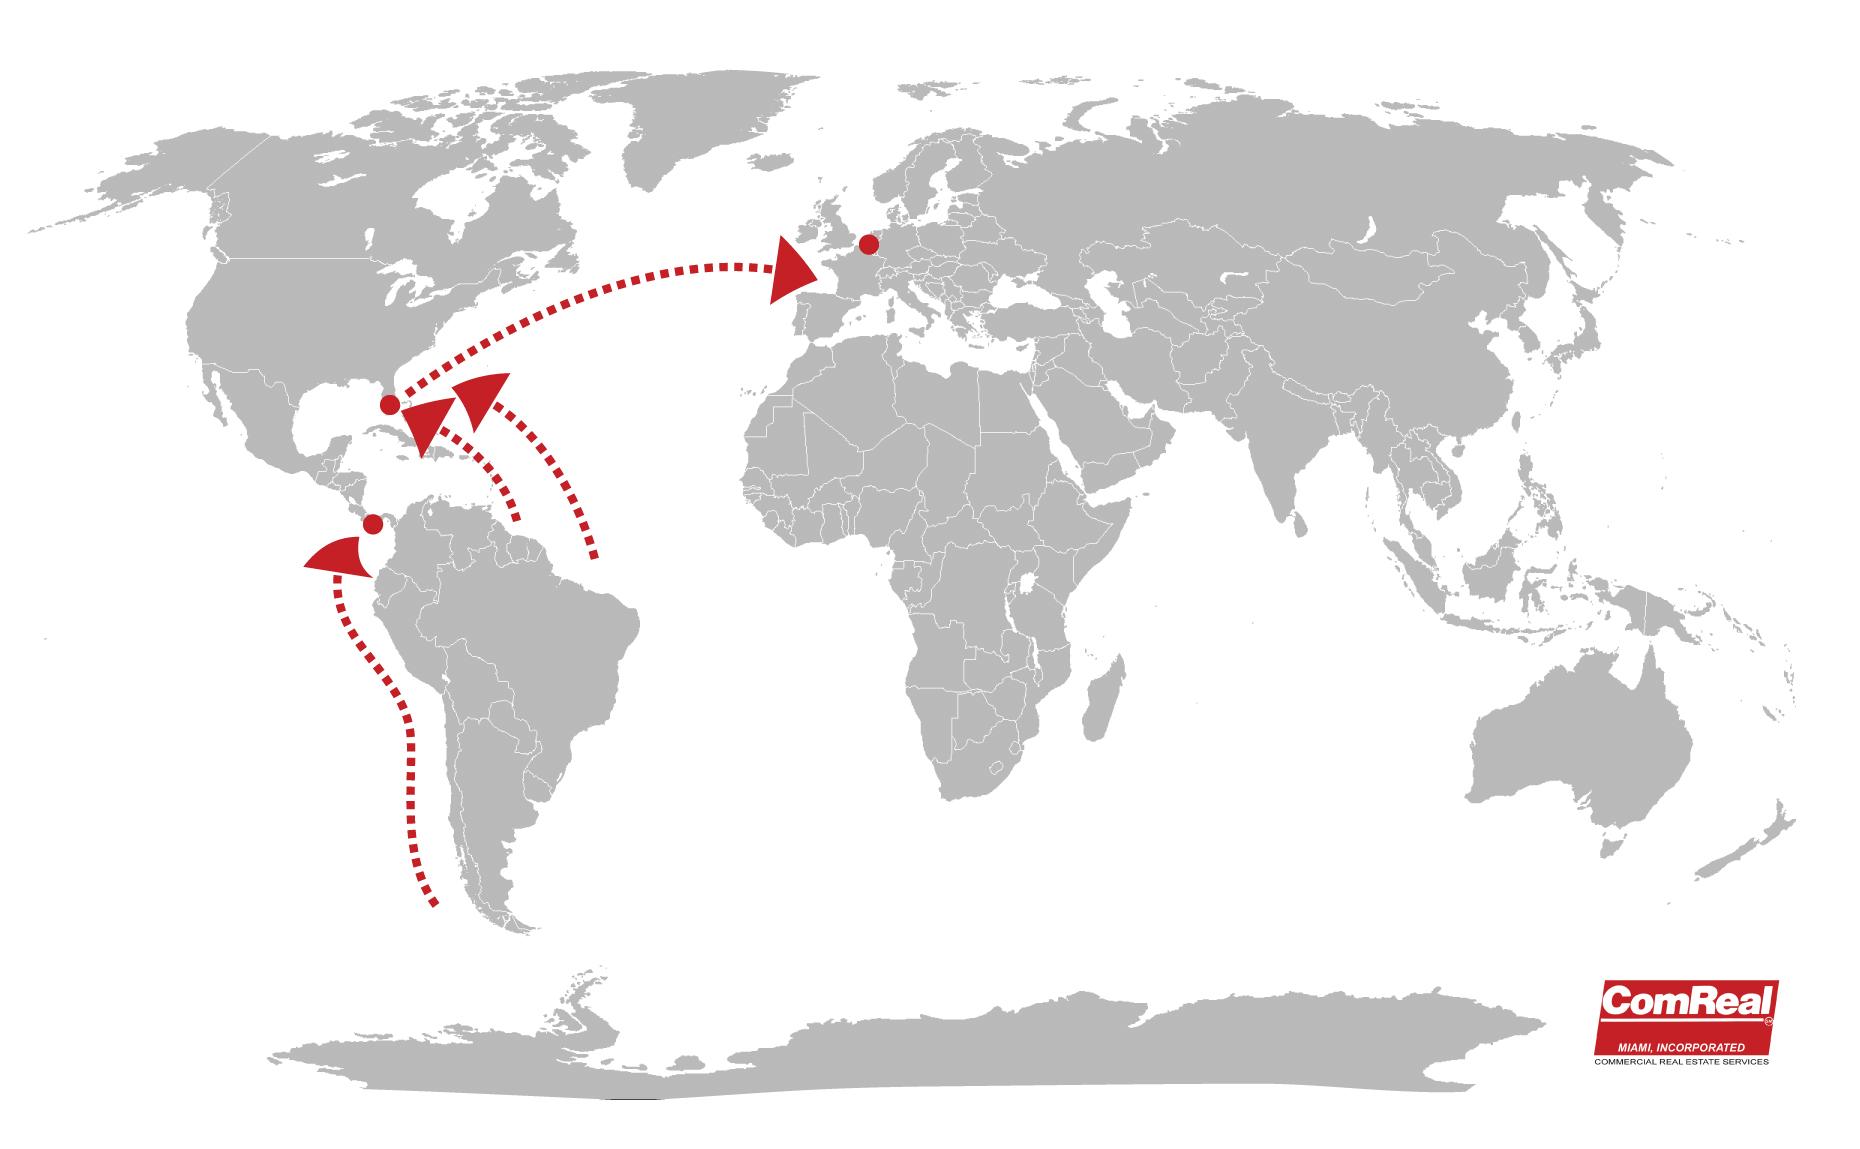 netherlands europe miami latin america map